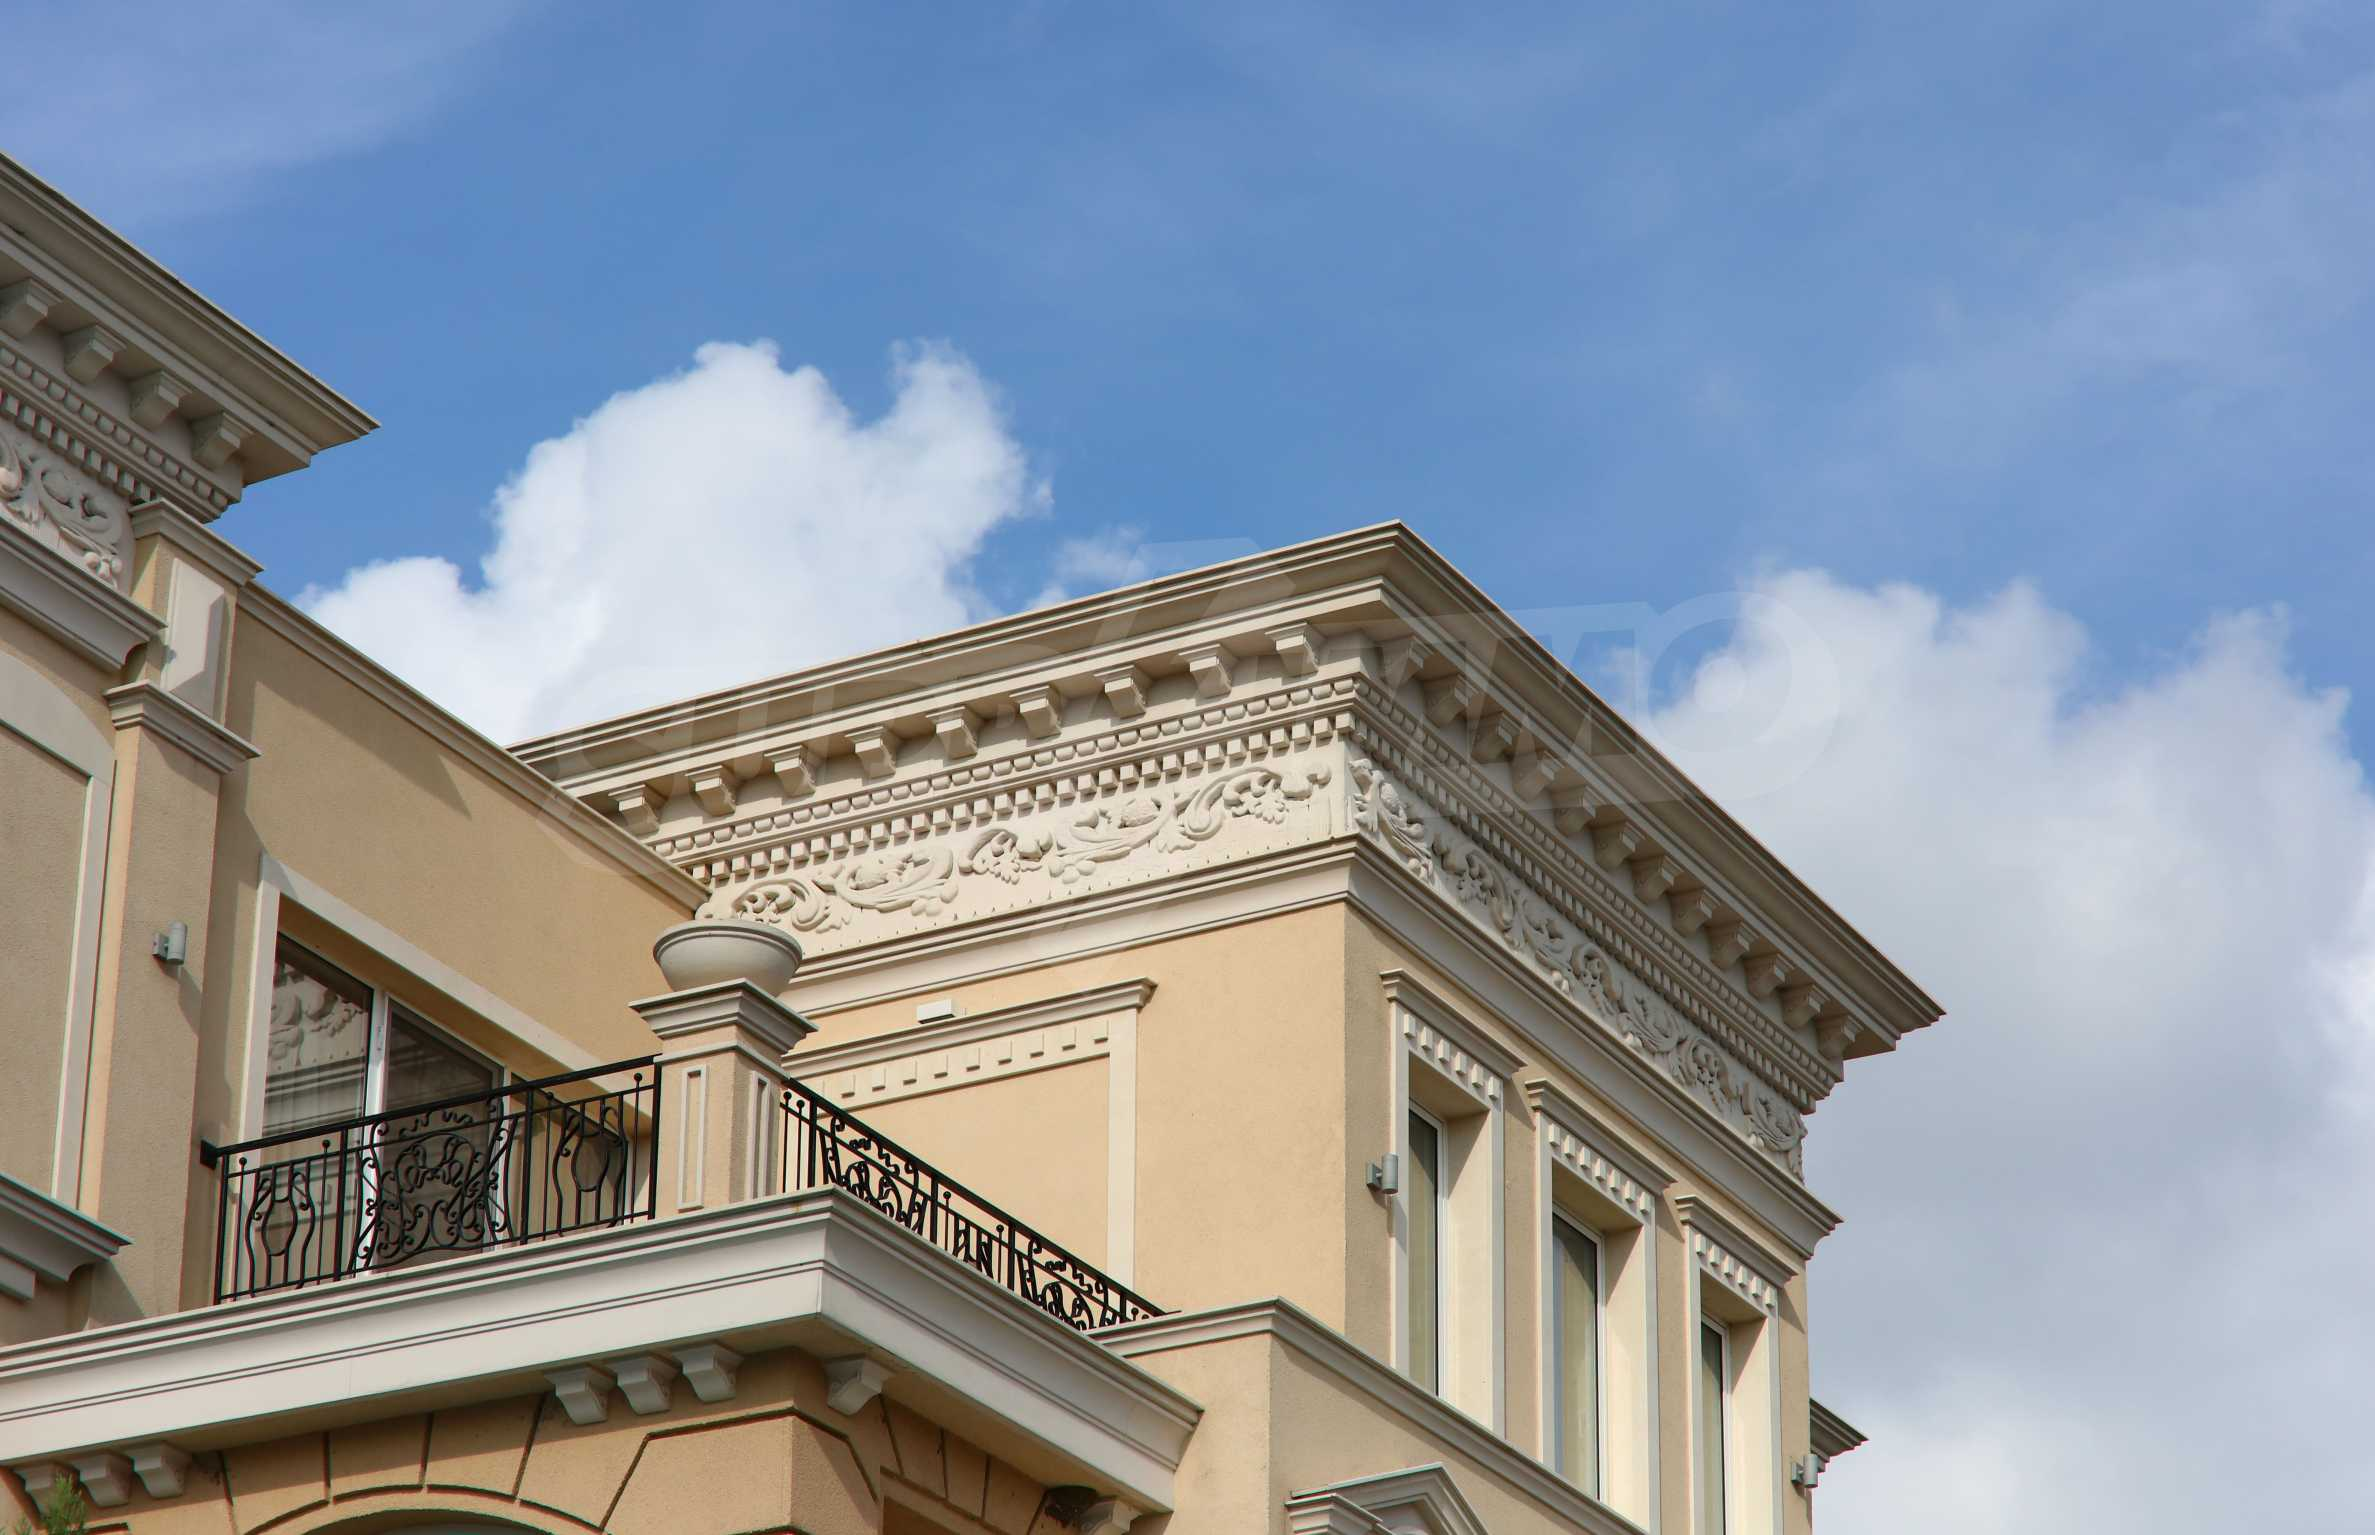 Дизайнерски тристаен апартамент под наем за летен сезон в резиденция Belle Époque в Лозенец 40